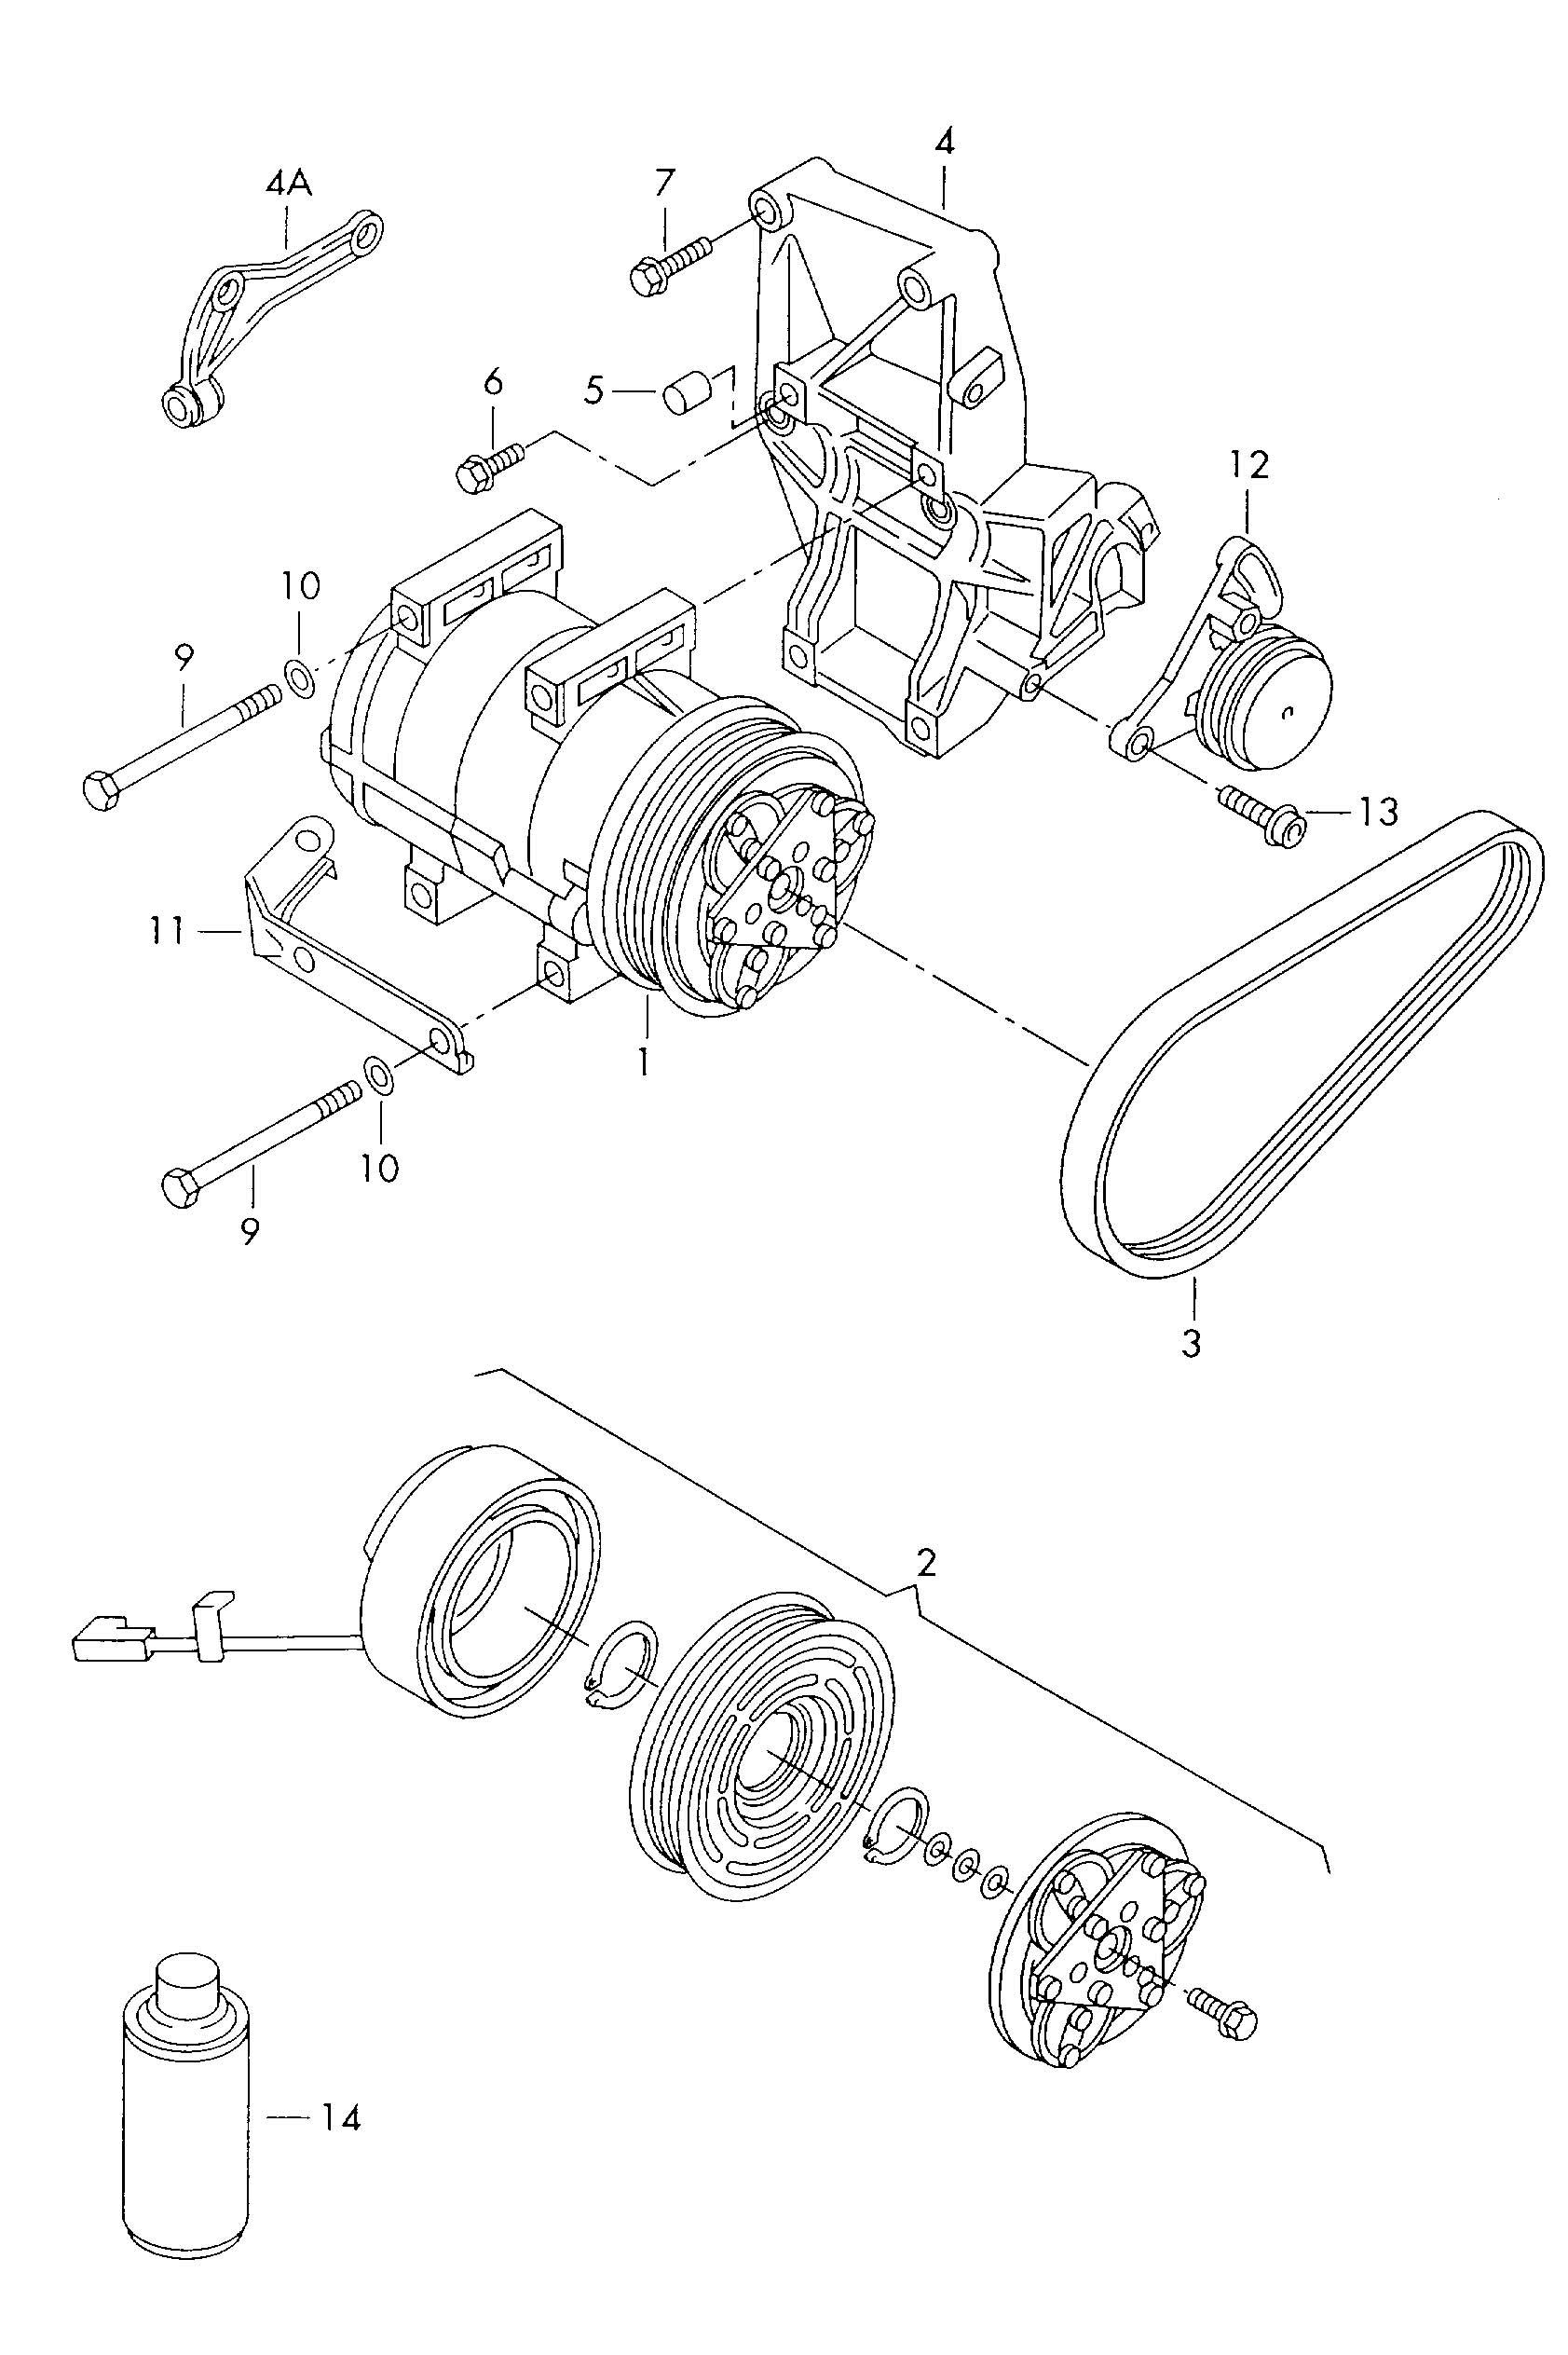 Volkswagen Passat Air Conditioner Compressor With Electro Magnetic Clutch Complete